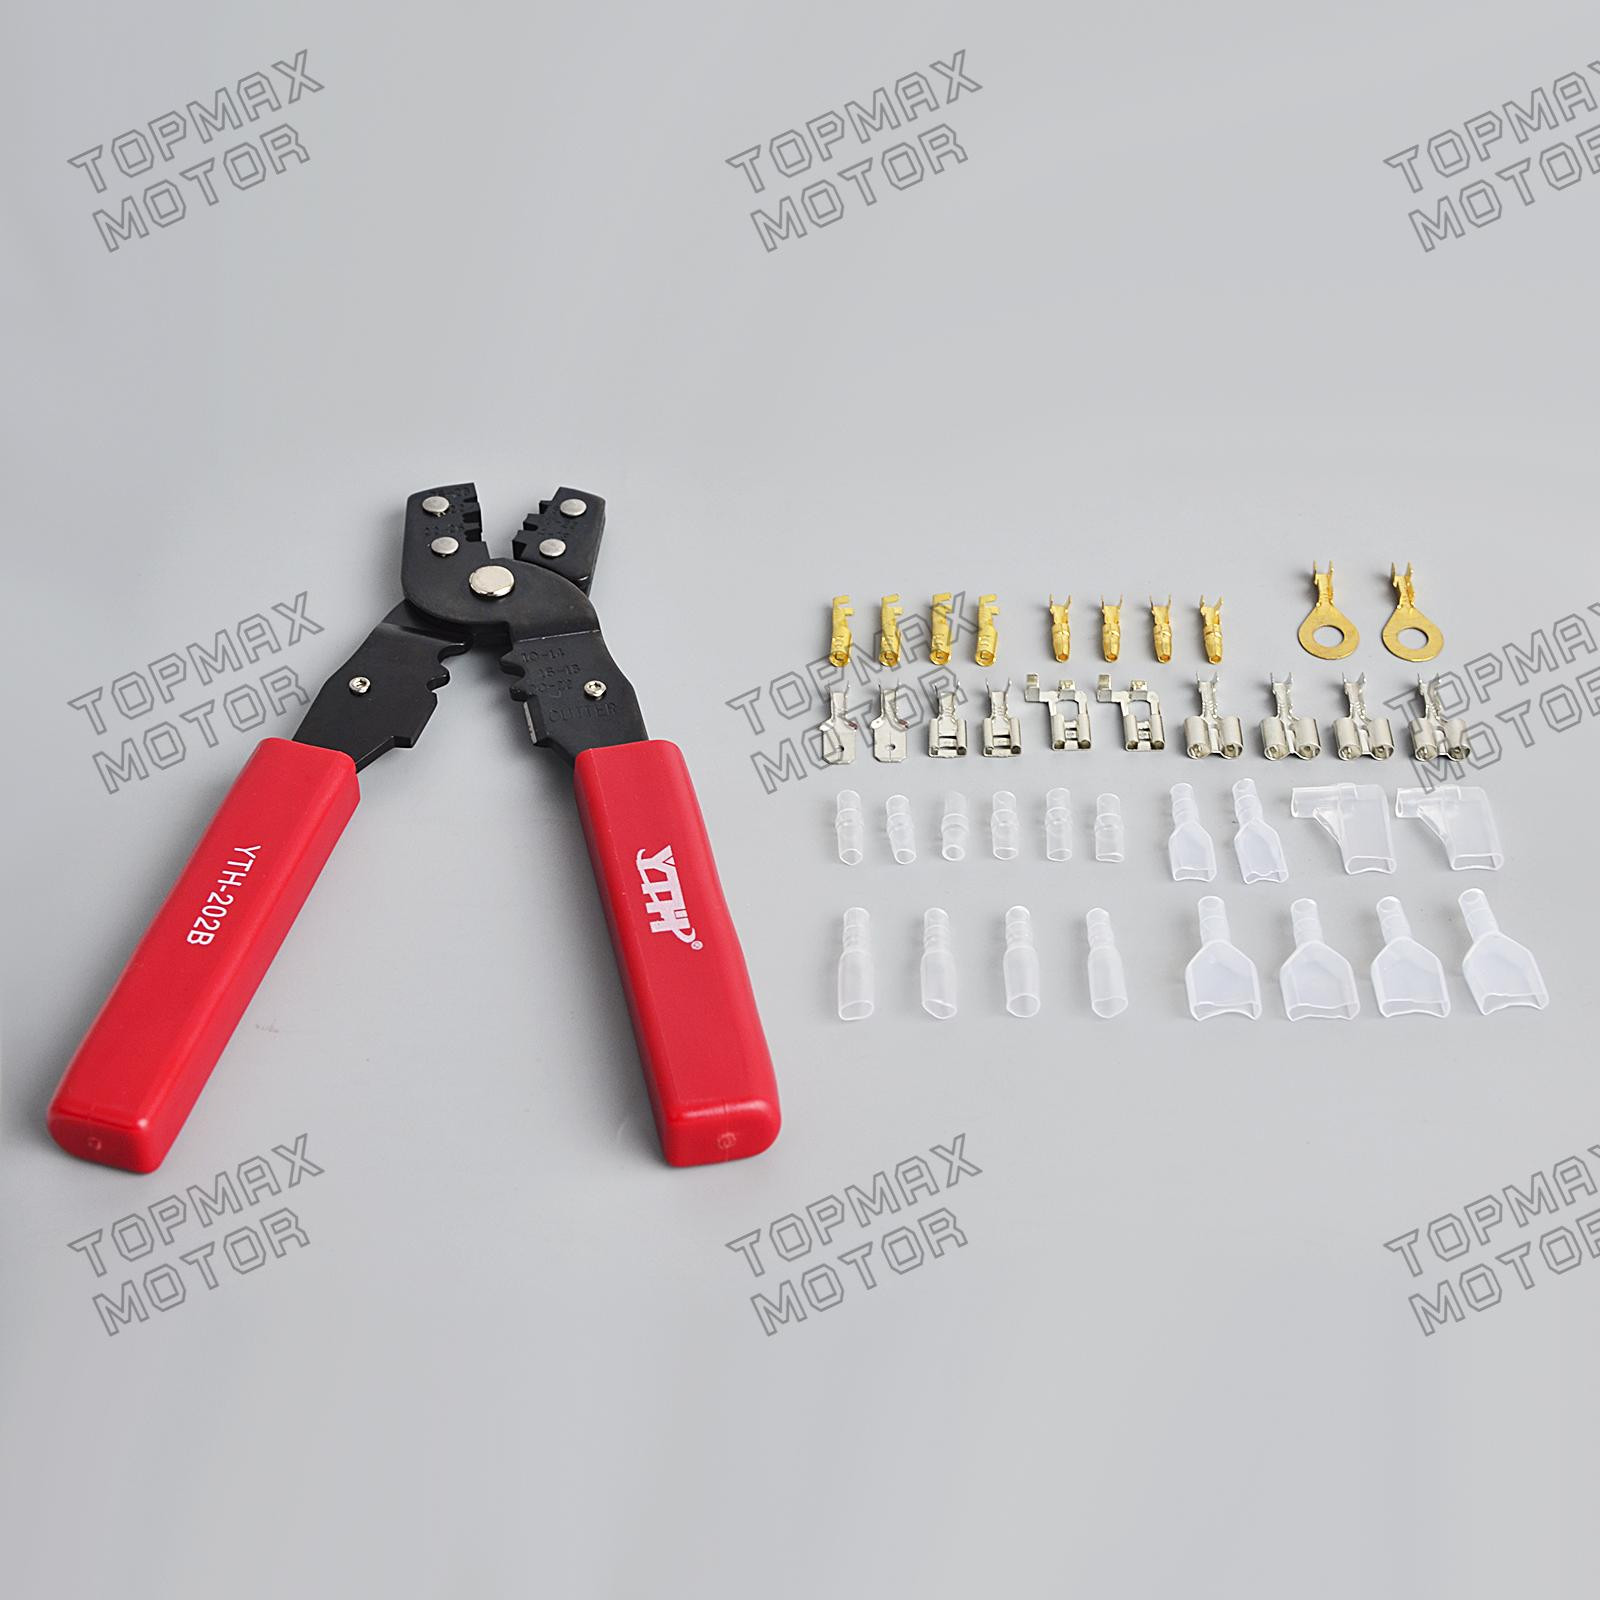 Insulated Crimp Terminal Crimping Hand Crimper Tool Pliers 3.9mm ...